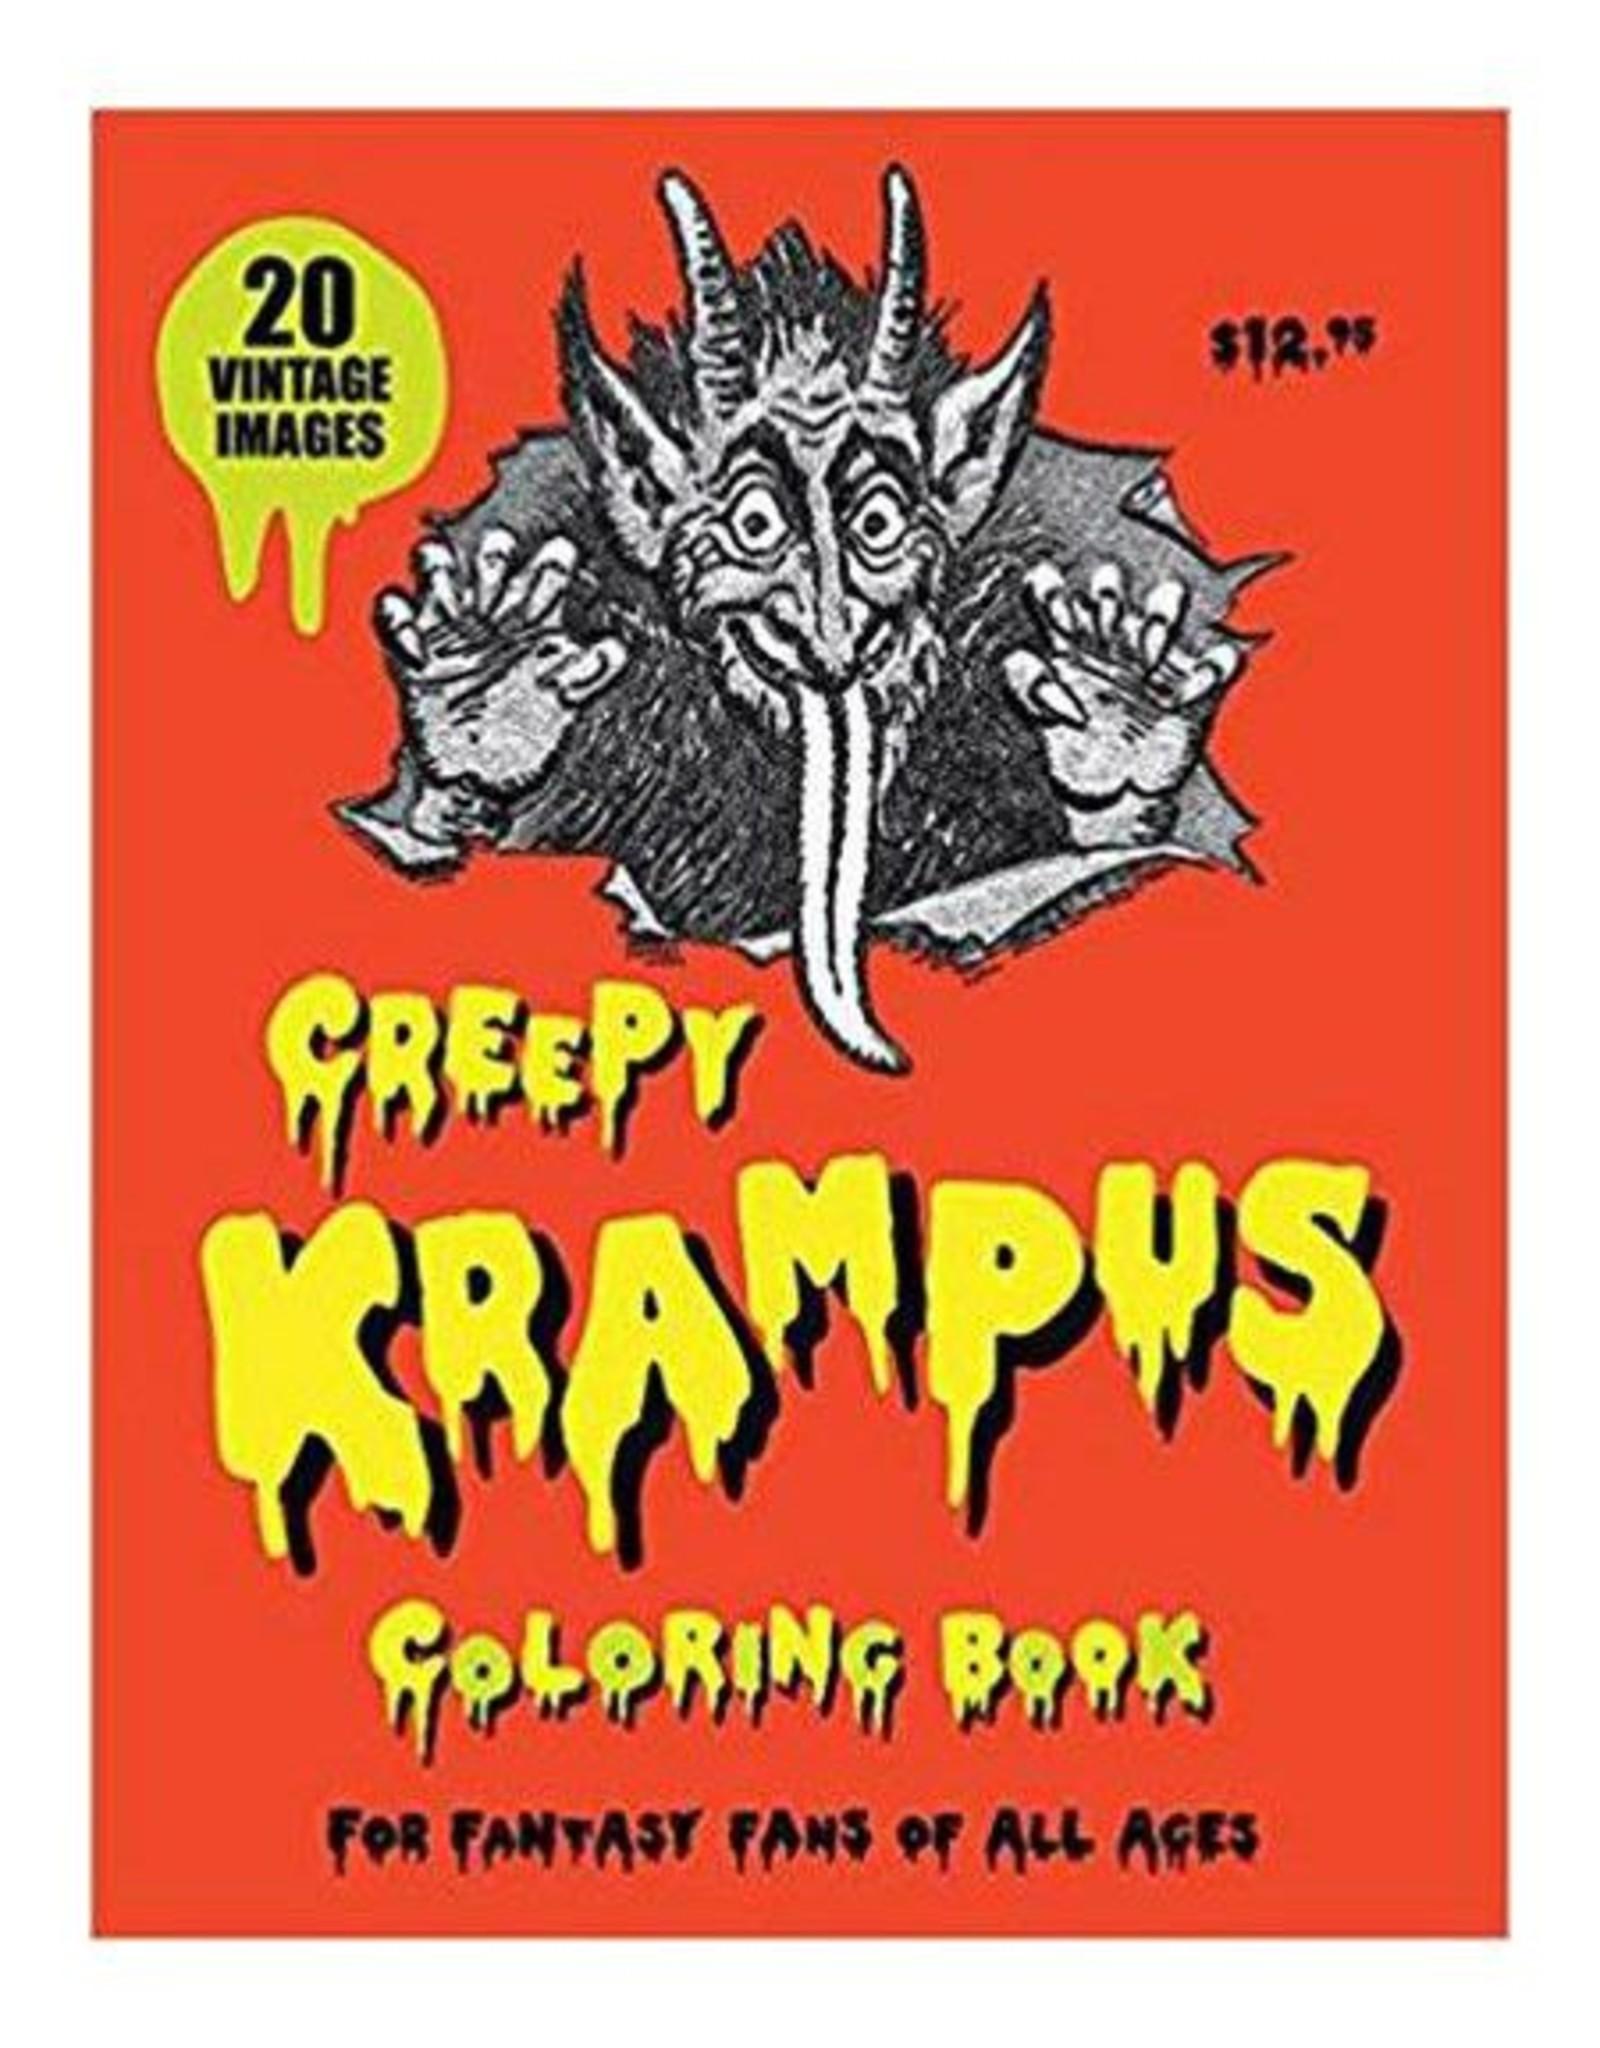 Creepy Krampus Coloring Book